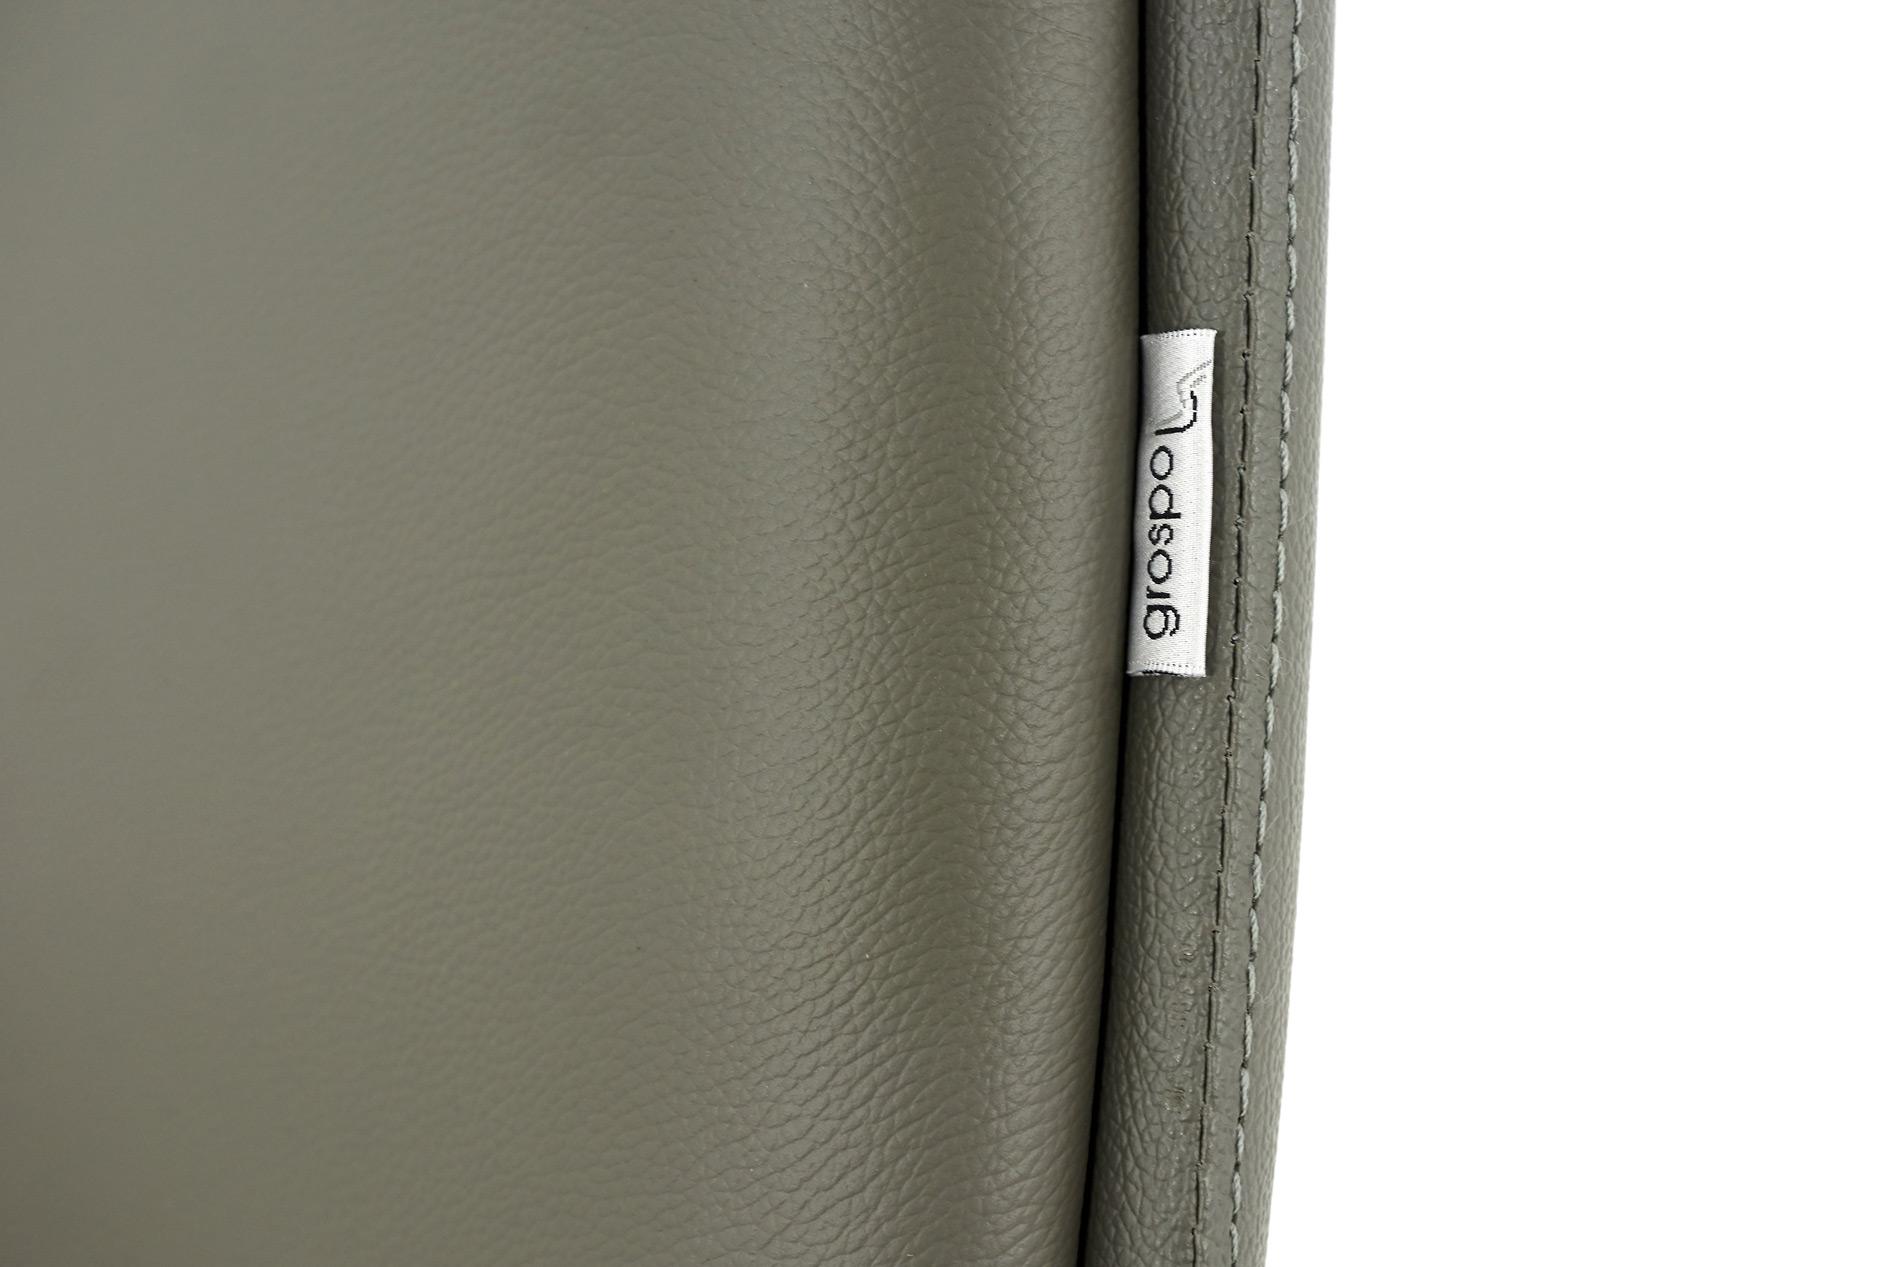 Modo natural grain leather SN5